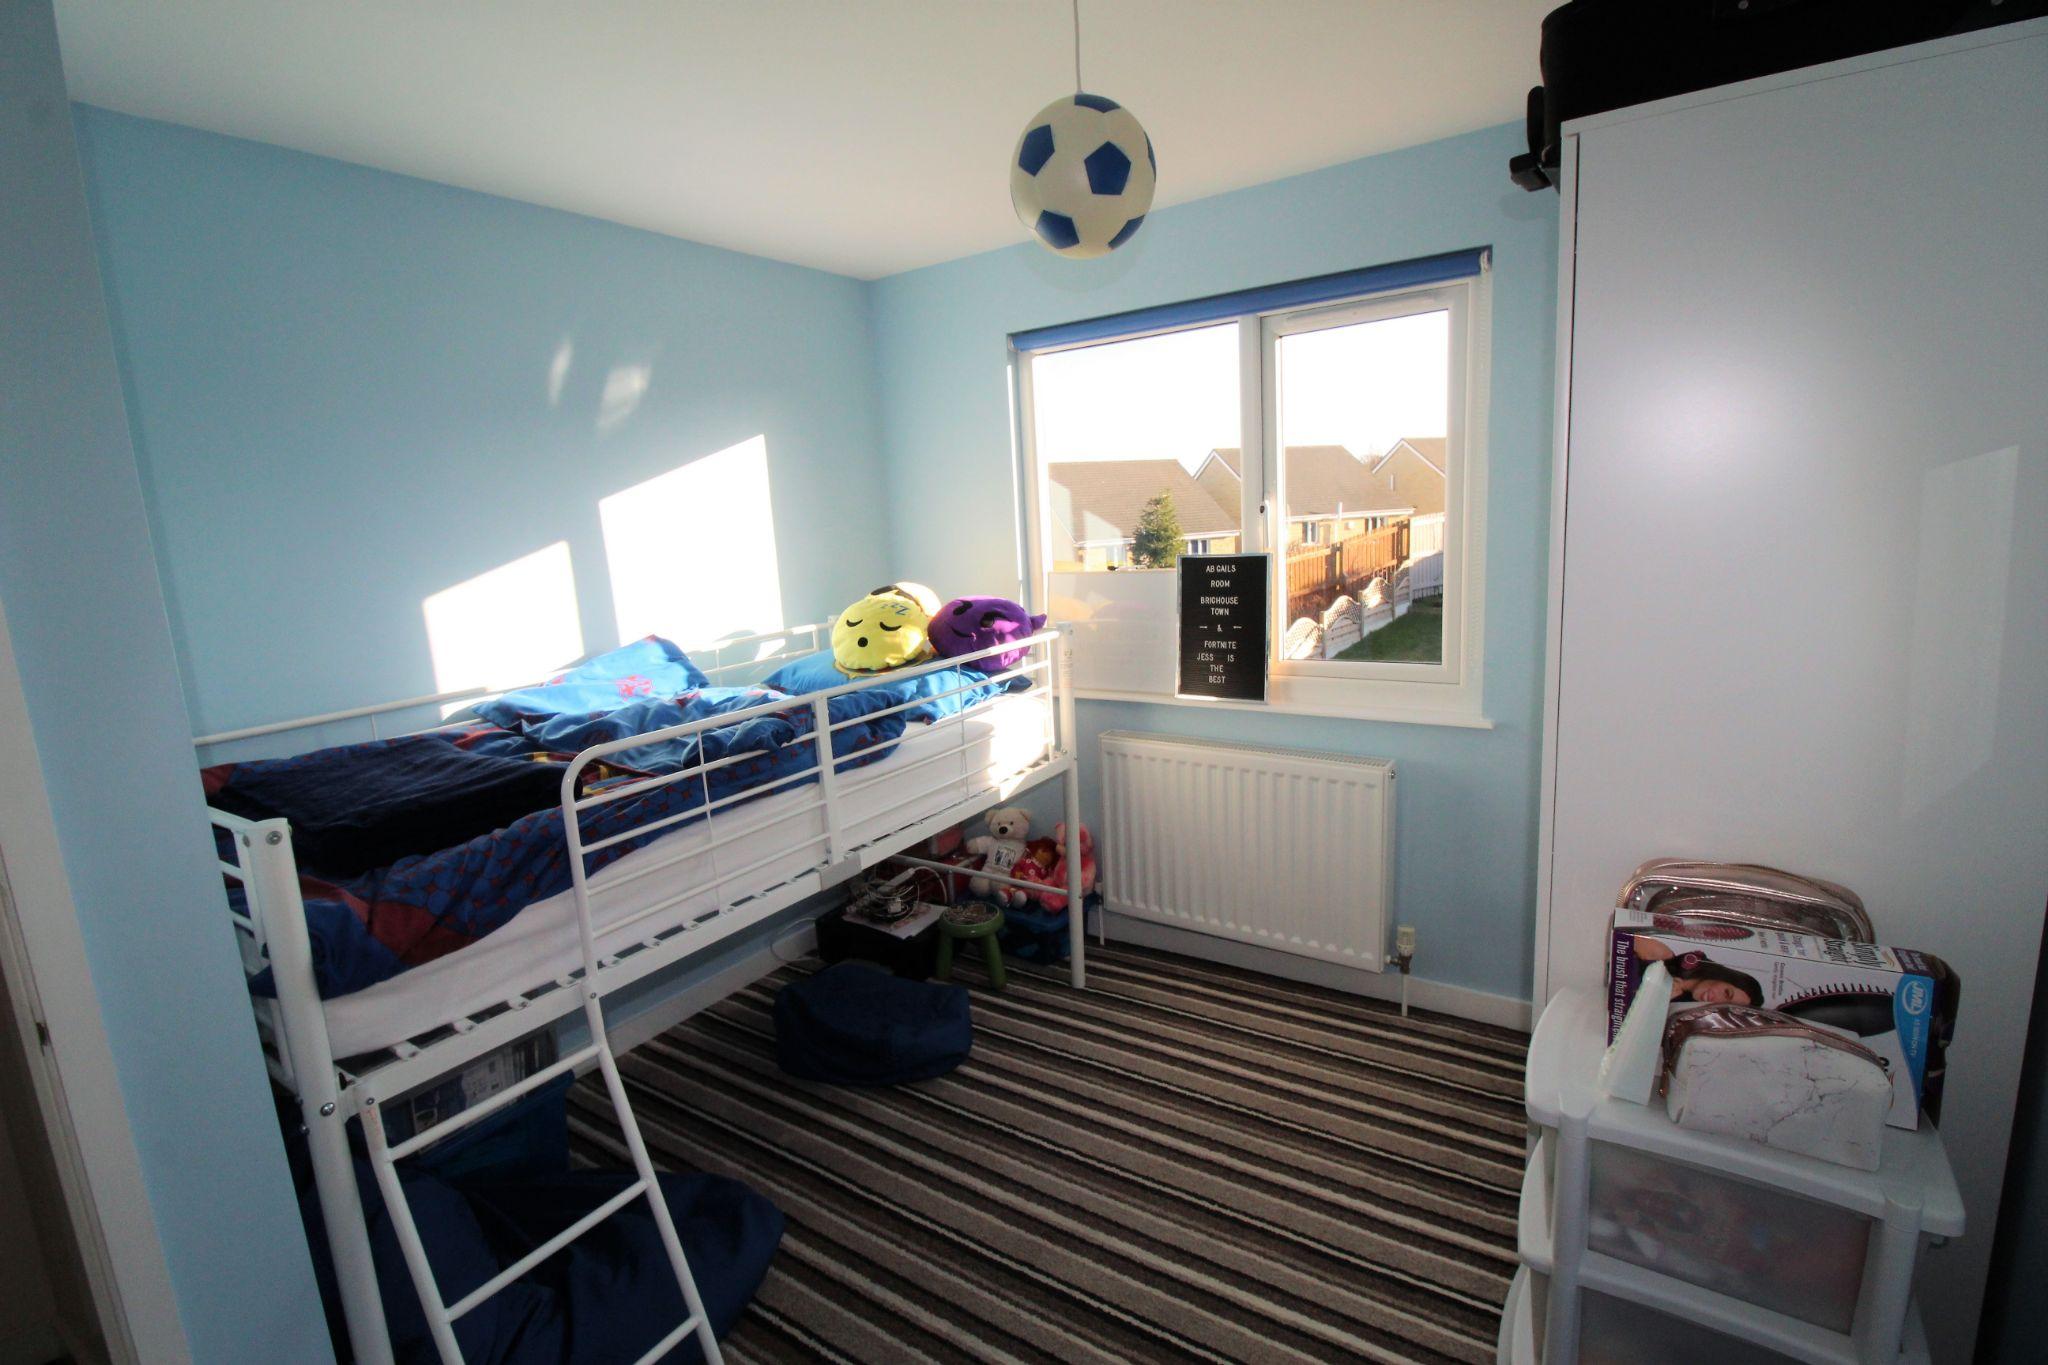 4 bedroom semi-detached bungalow SSTC in Brighouse - Bedroom 3